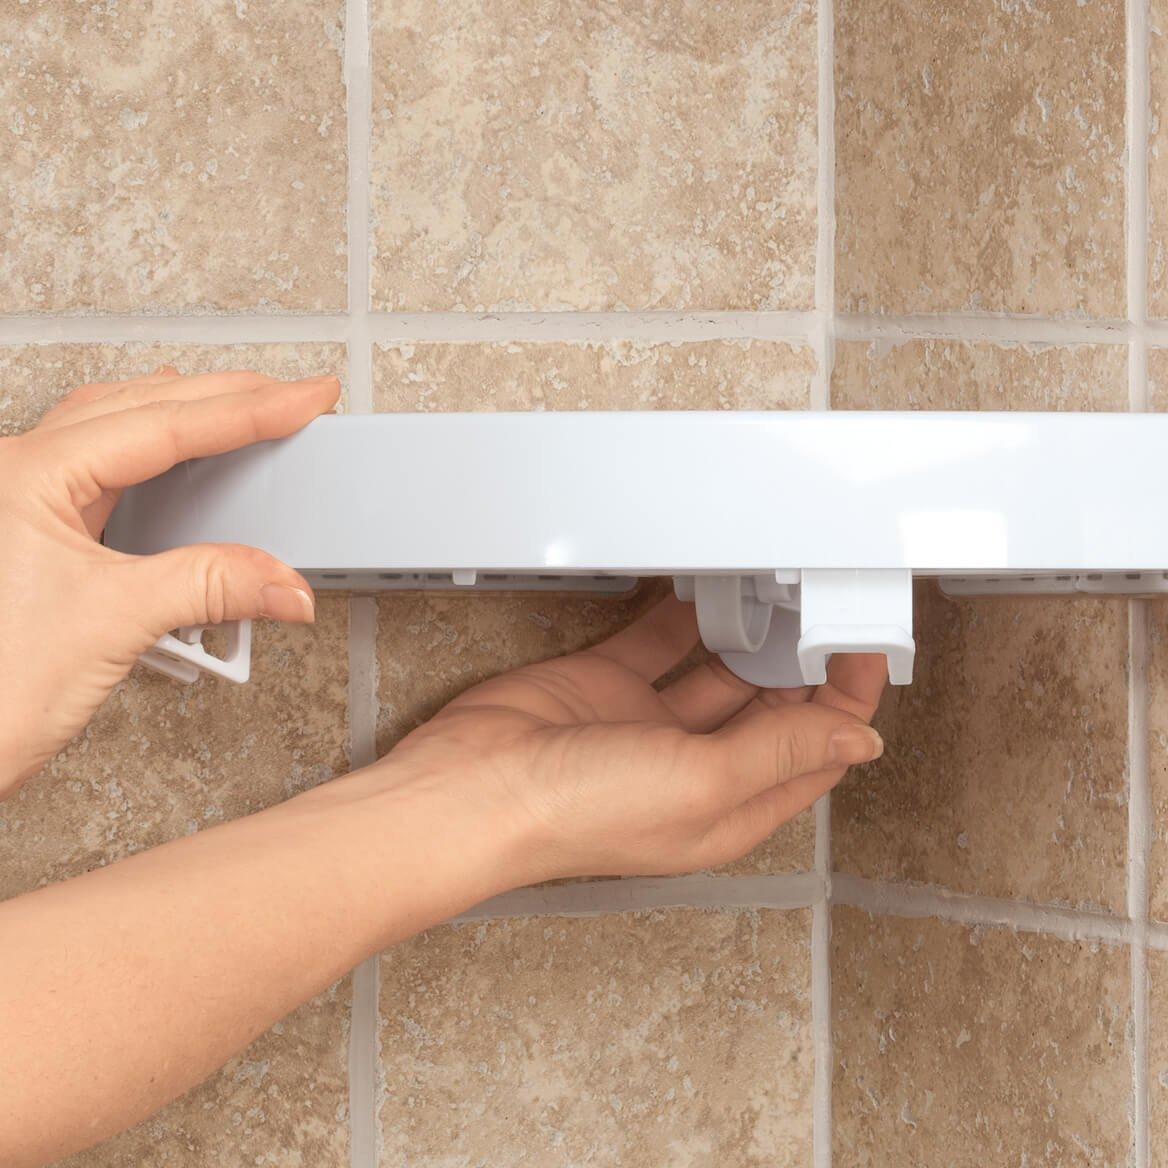 Fox Valley Traders Self Adhesive Corner Shelf Wall Mounted Bathroom Shower Organizer Shelf No Damage to Walls Easy Storage